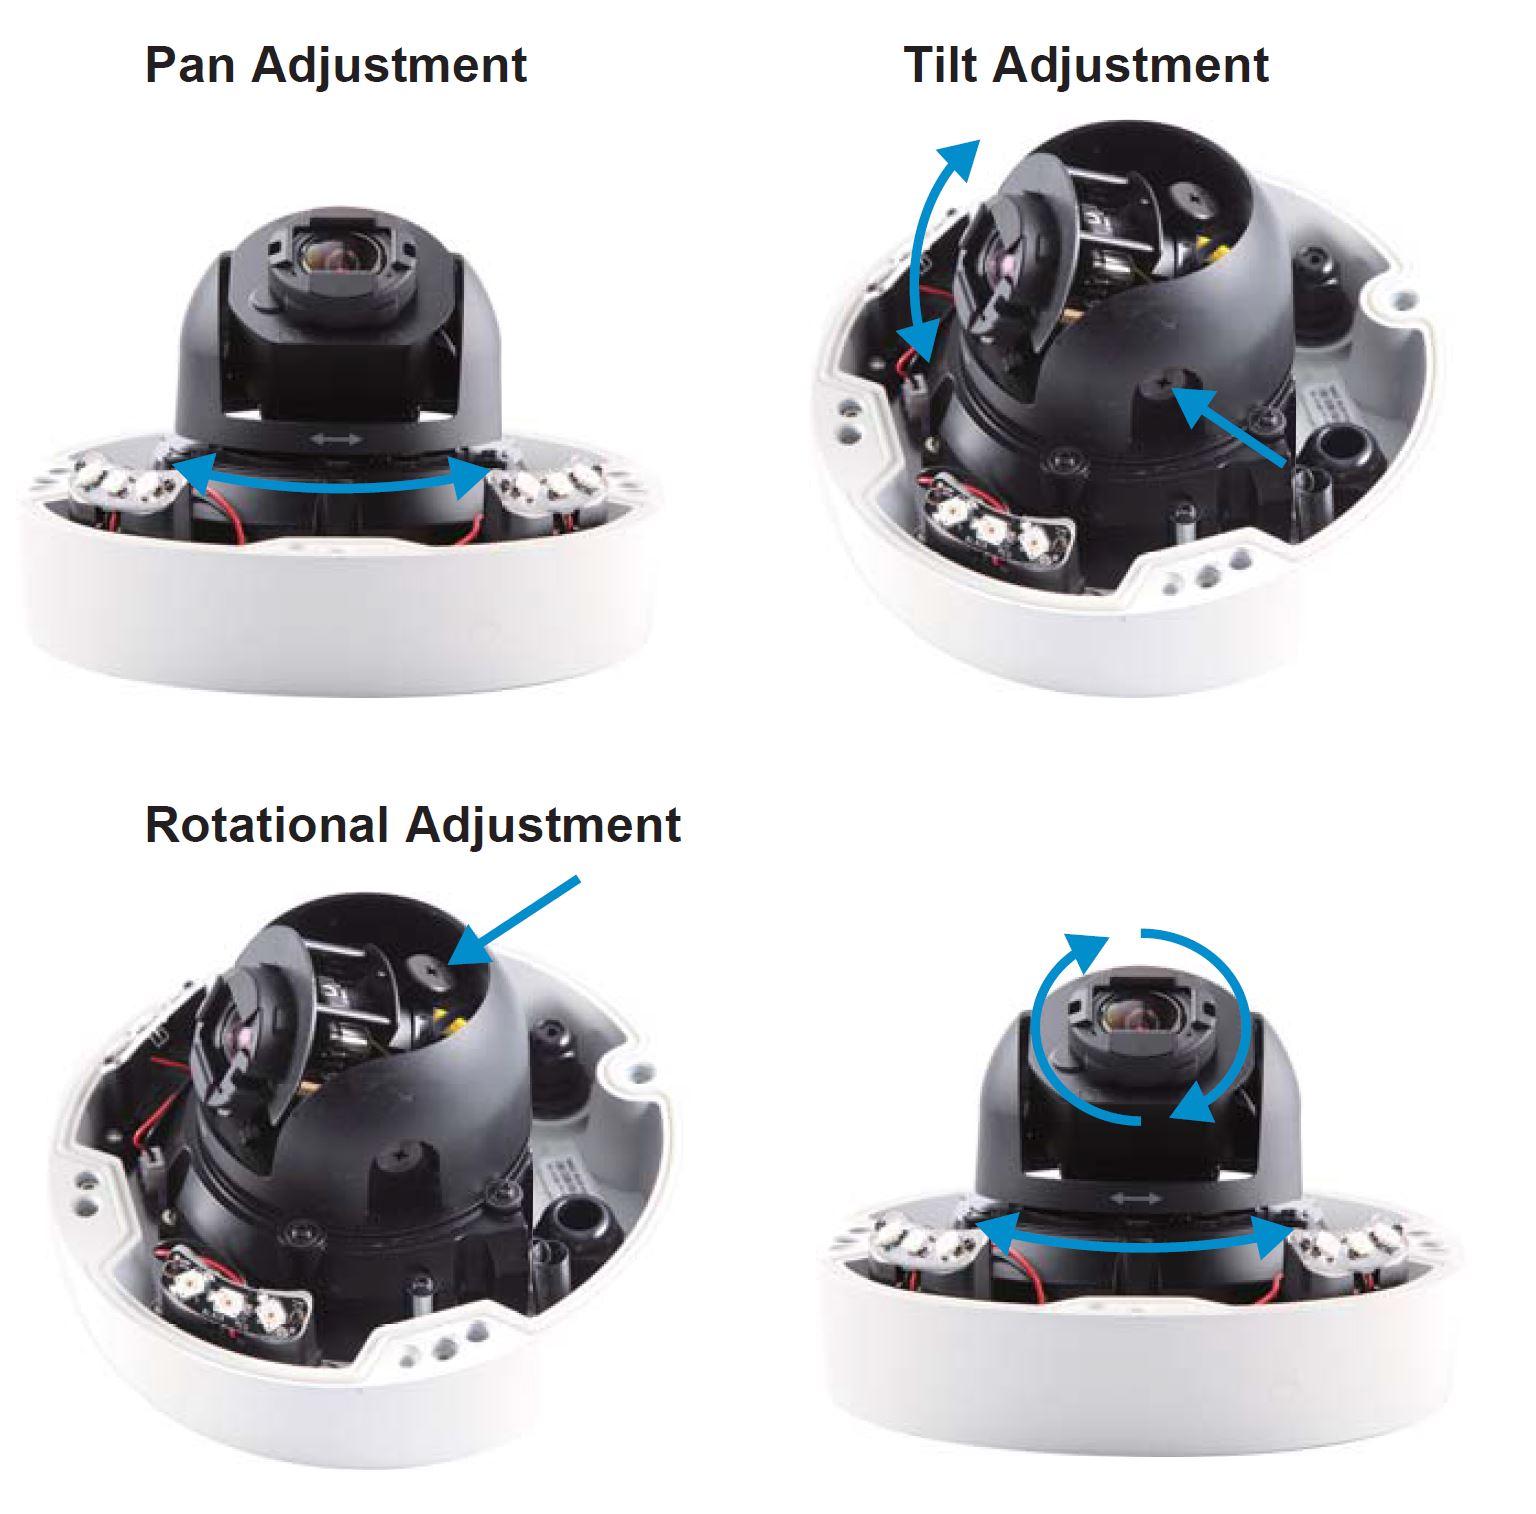 gv-vd-pan-tilt-rotate-adjustment.jpg